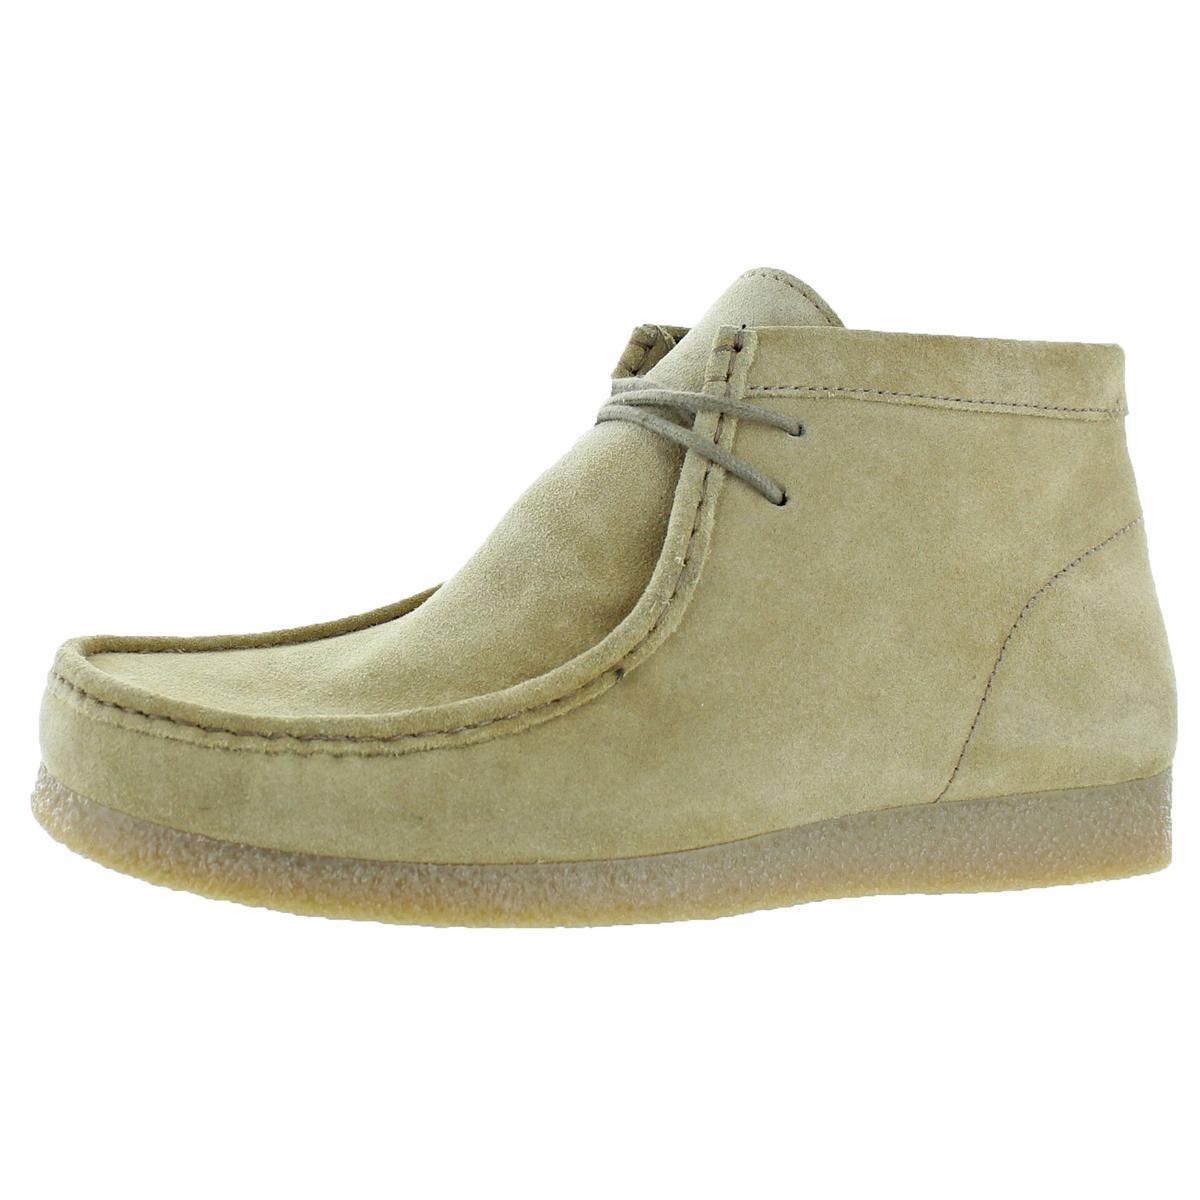 Steve Madden  Uomo Troy Moc Stiefel Toe Ankle Fashion Chukka Stiefel Moc Schuhes BHFO 6081 a1760c